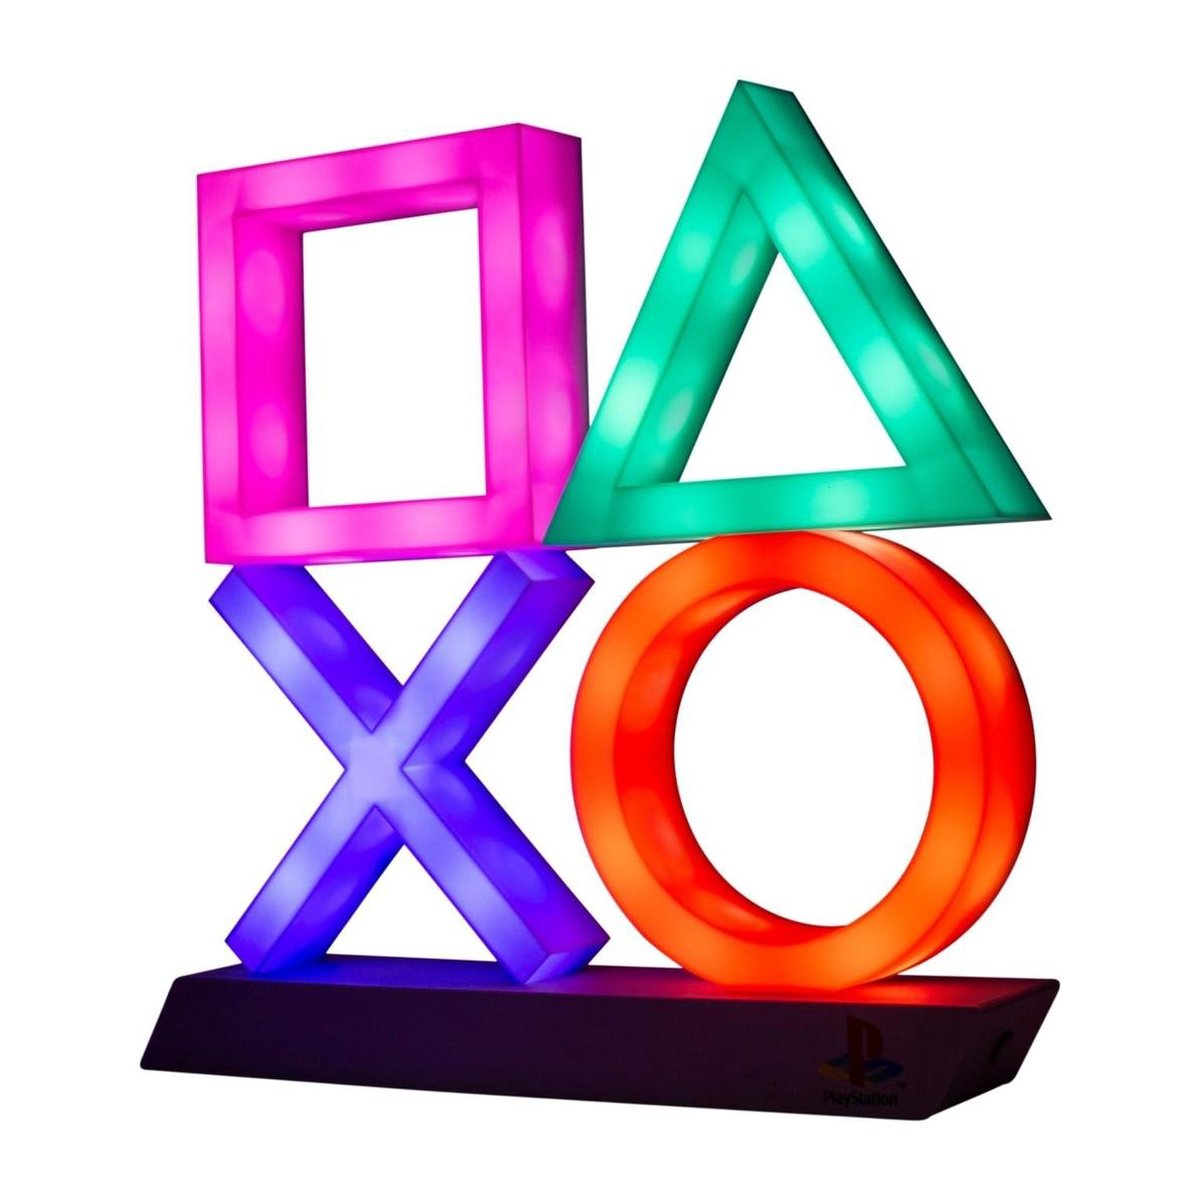 Paladone Playstation Logo Nachtlamp - Icon Light  - 3D Lamp - LED Licht